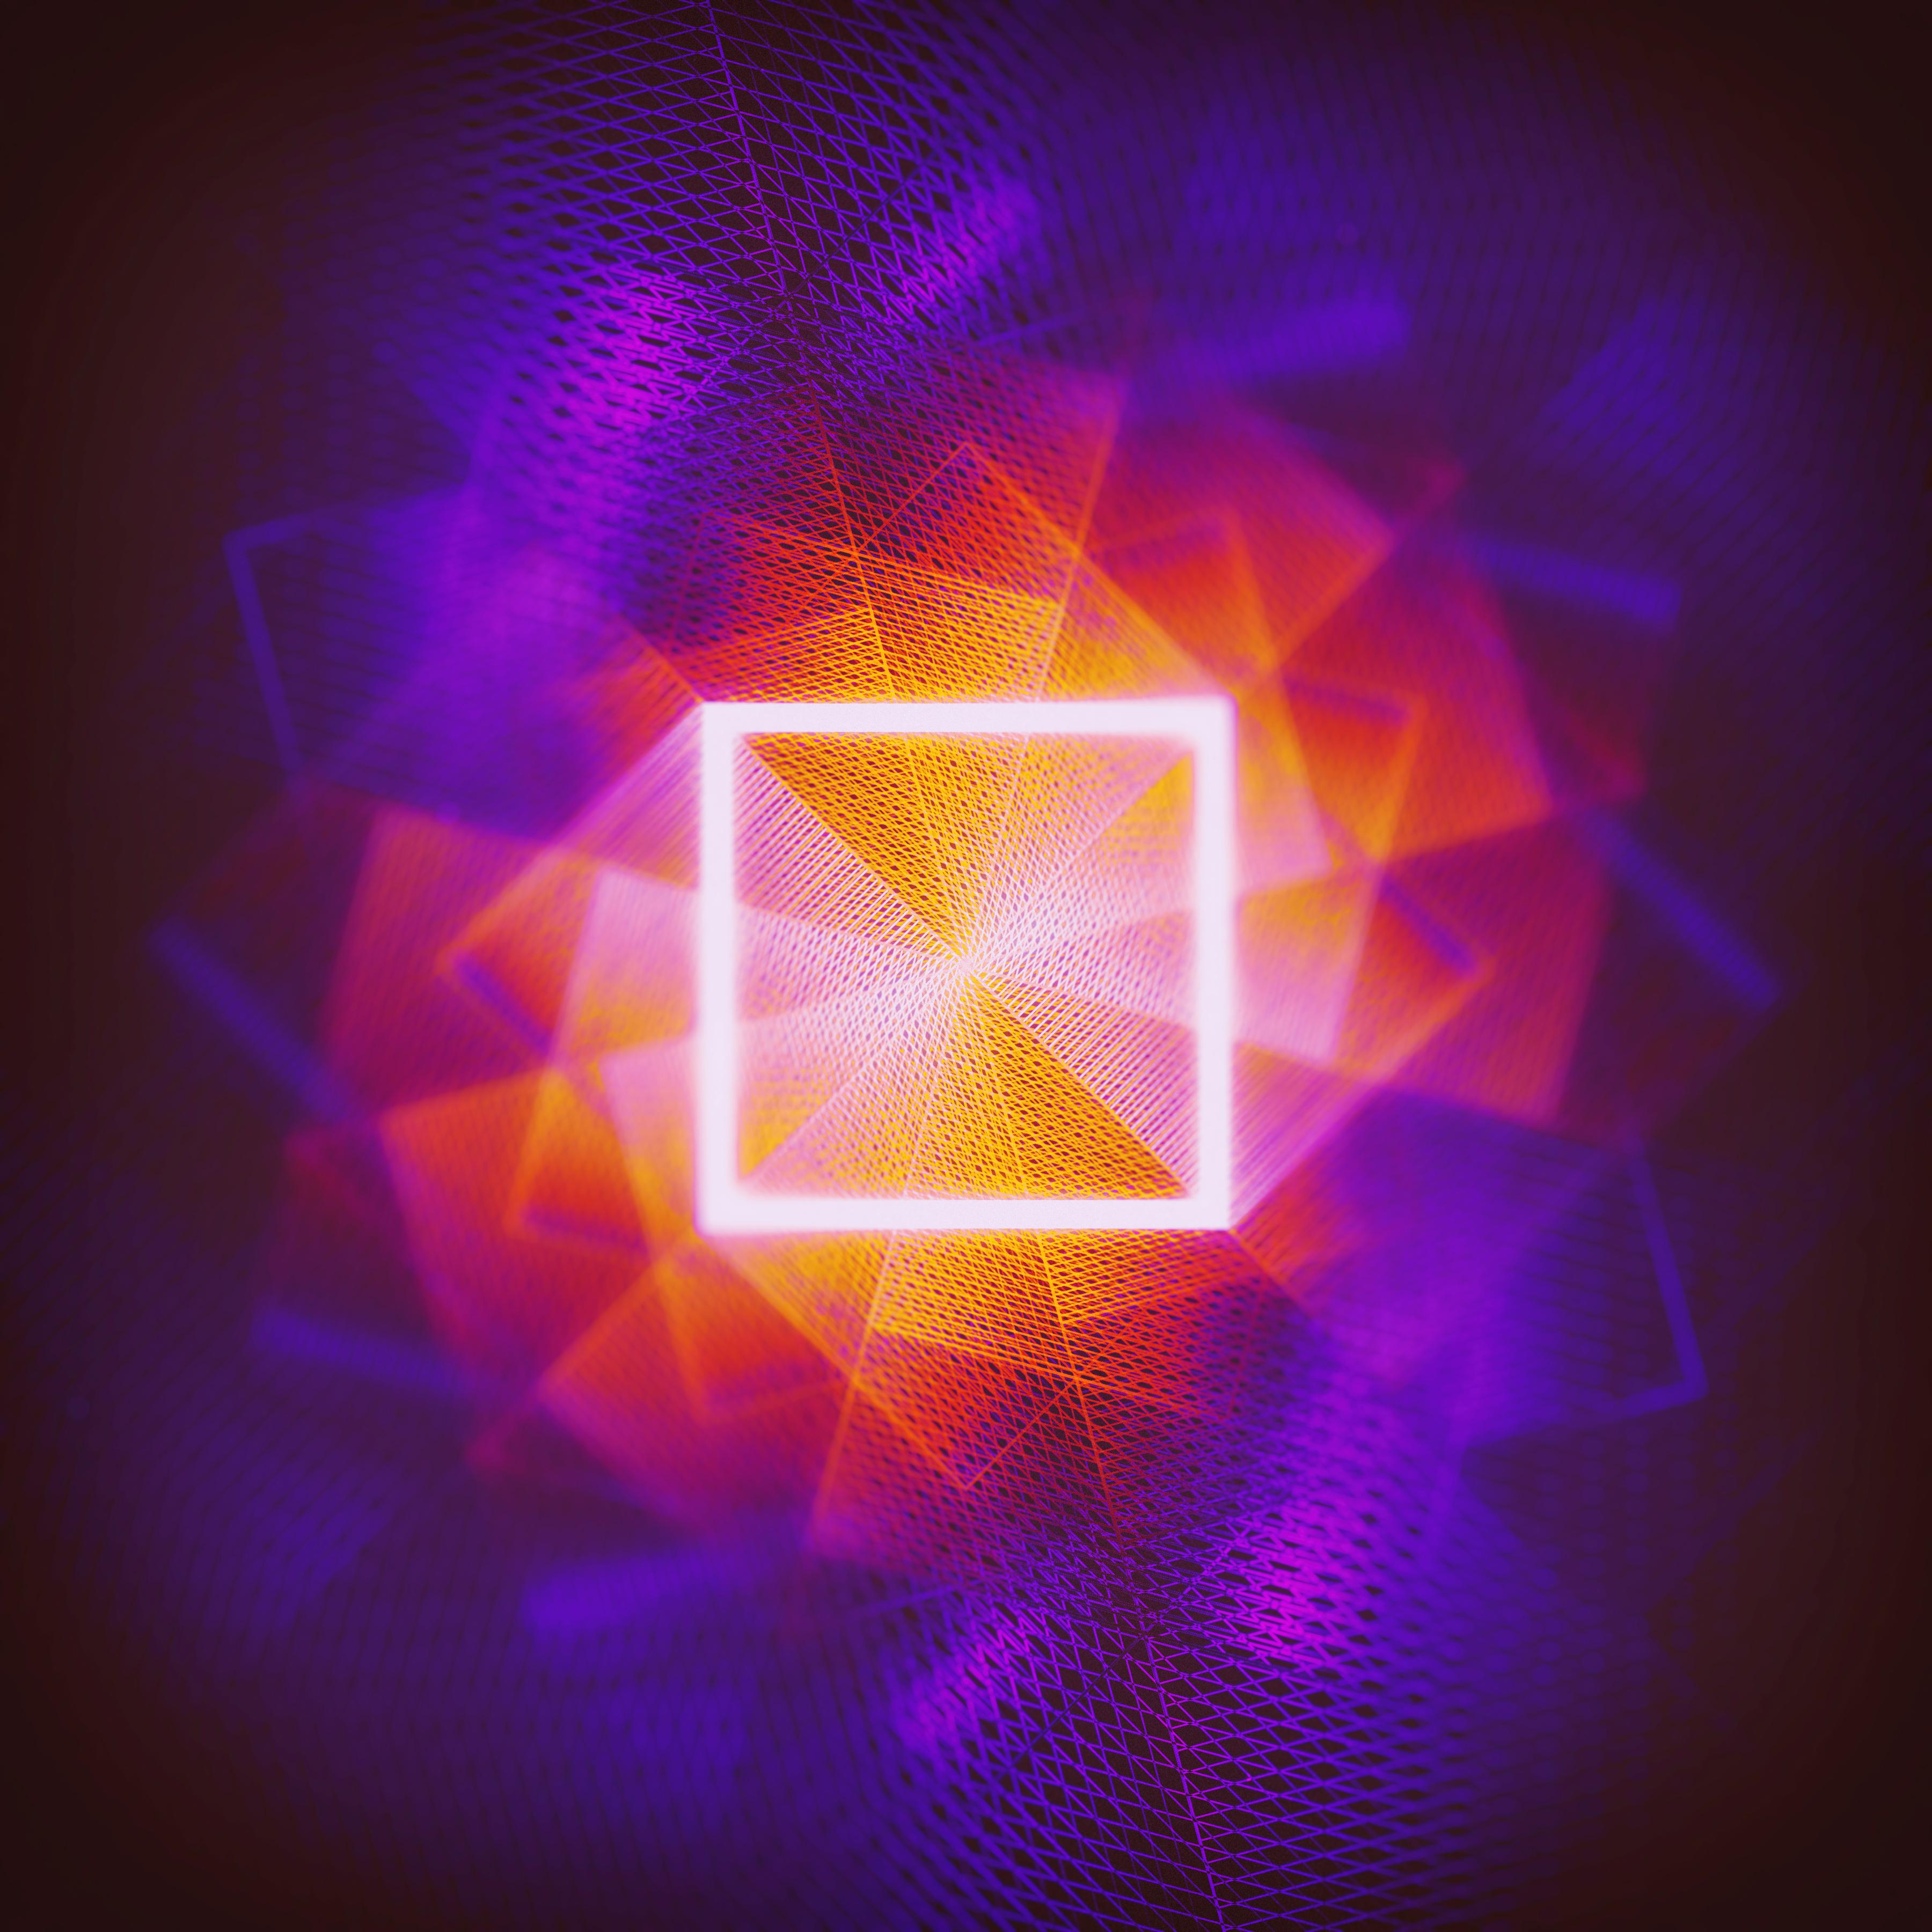 2048x1152 New Lights Abstract 4k 2048x1152 Resolution HD